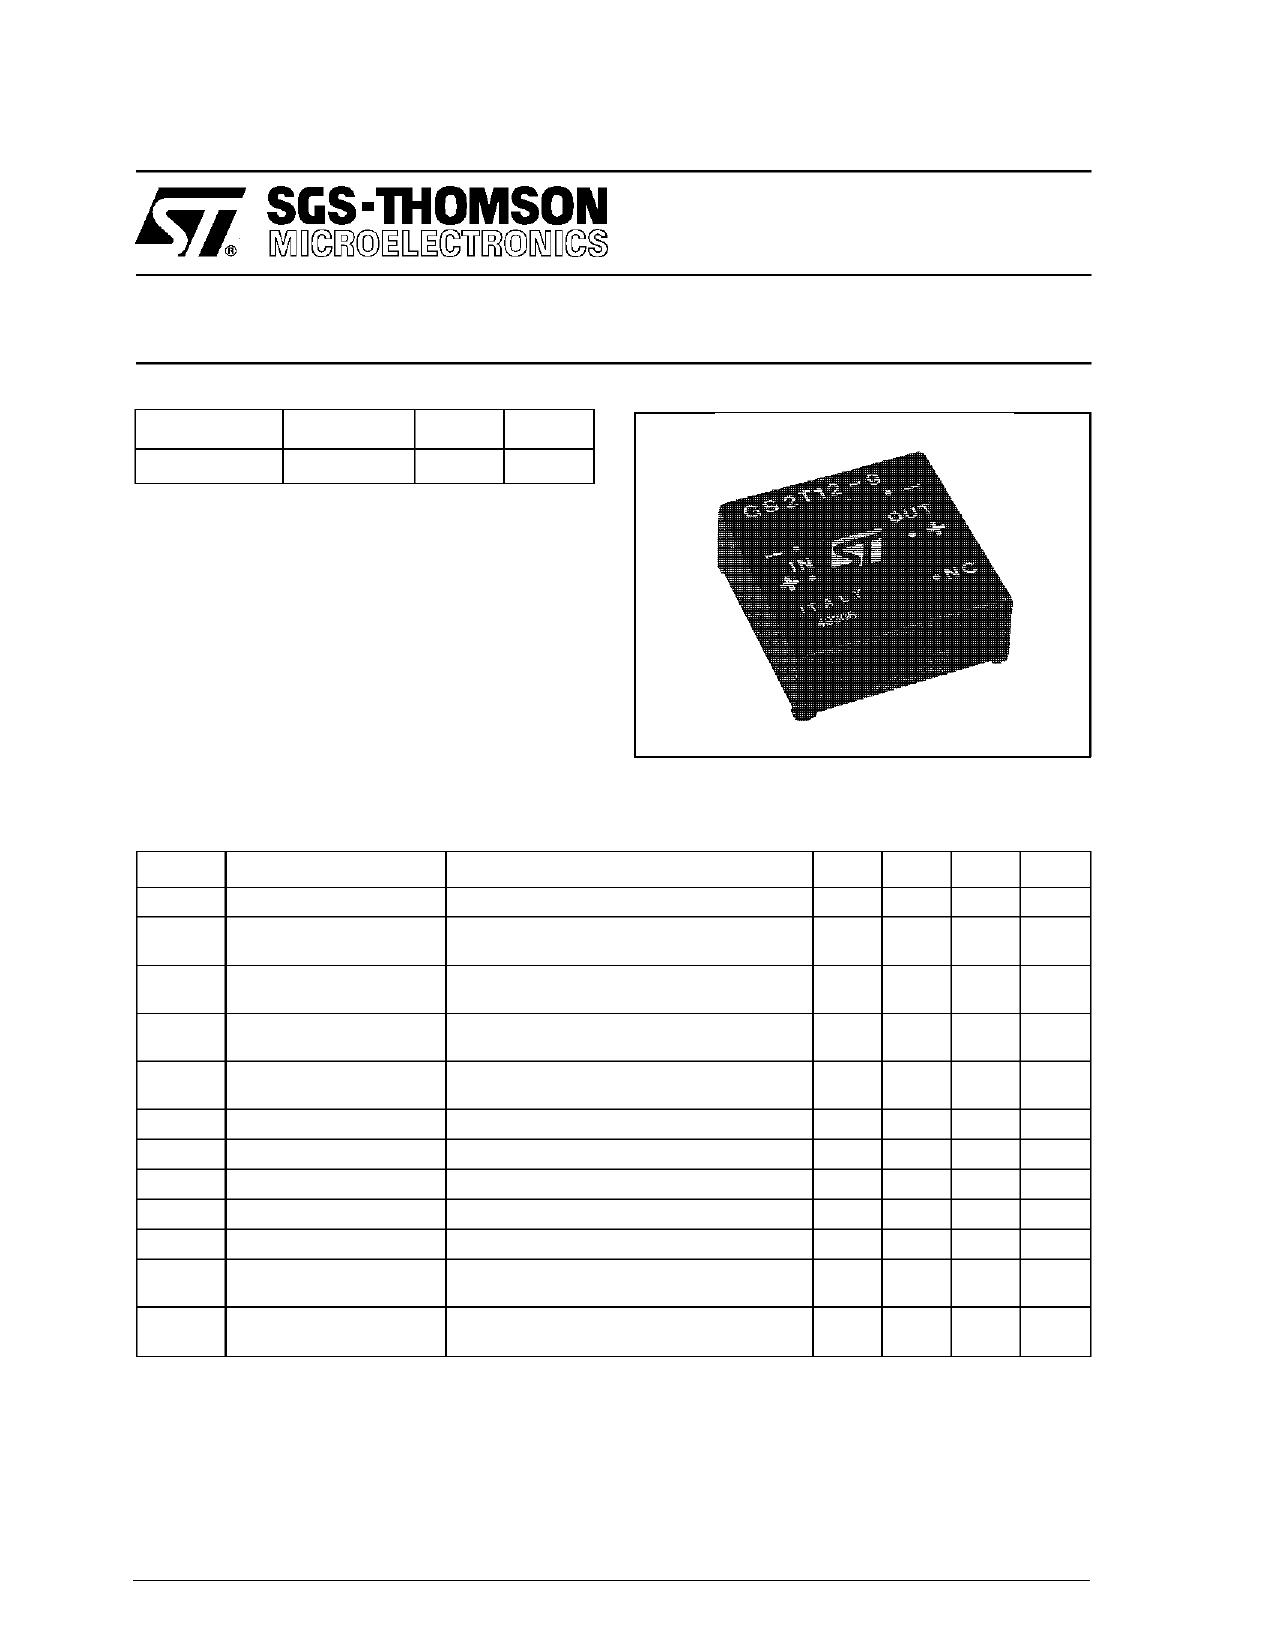 GS2T12-9 datasheet